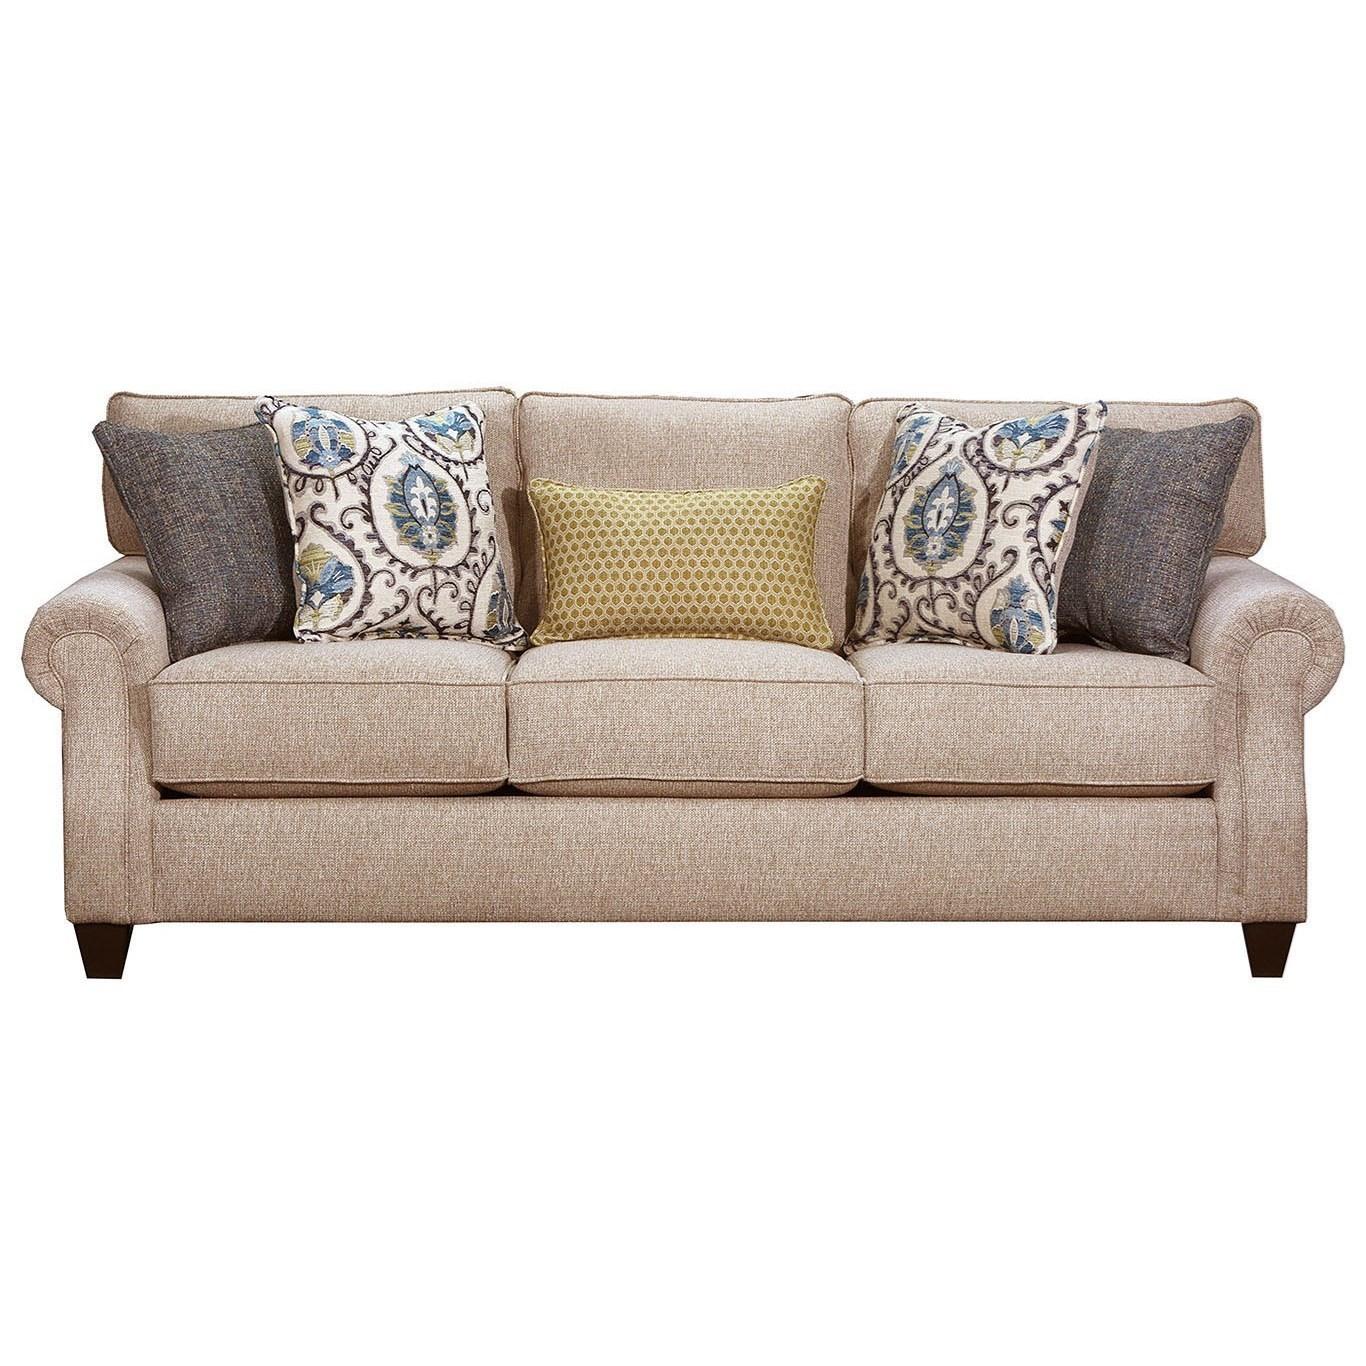 8010 Sofa by Lane at Darvin Furniture